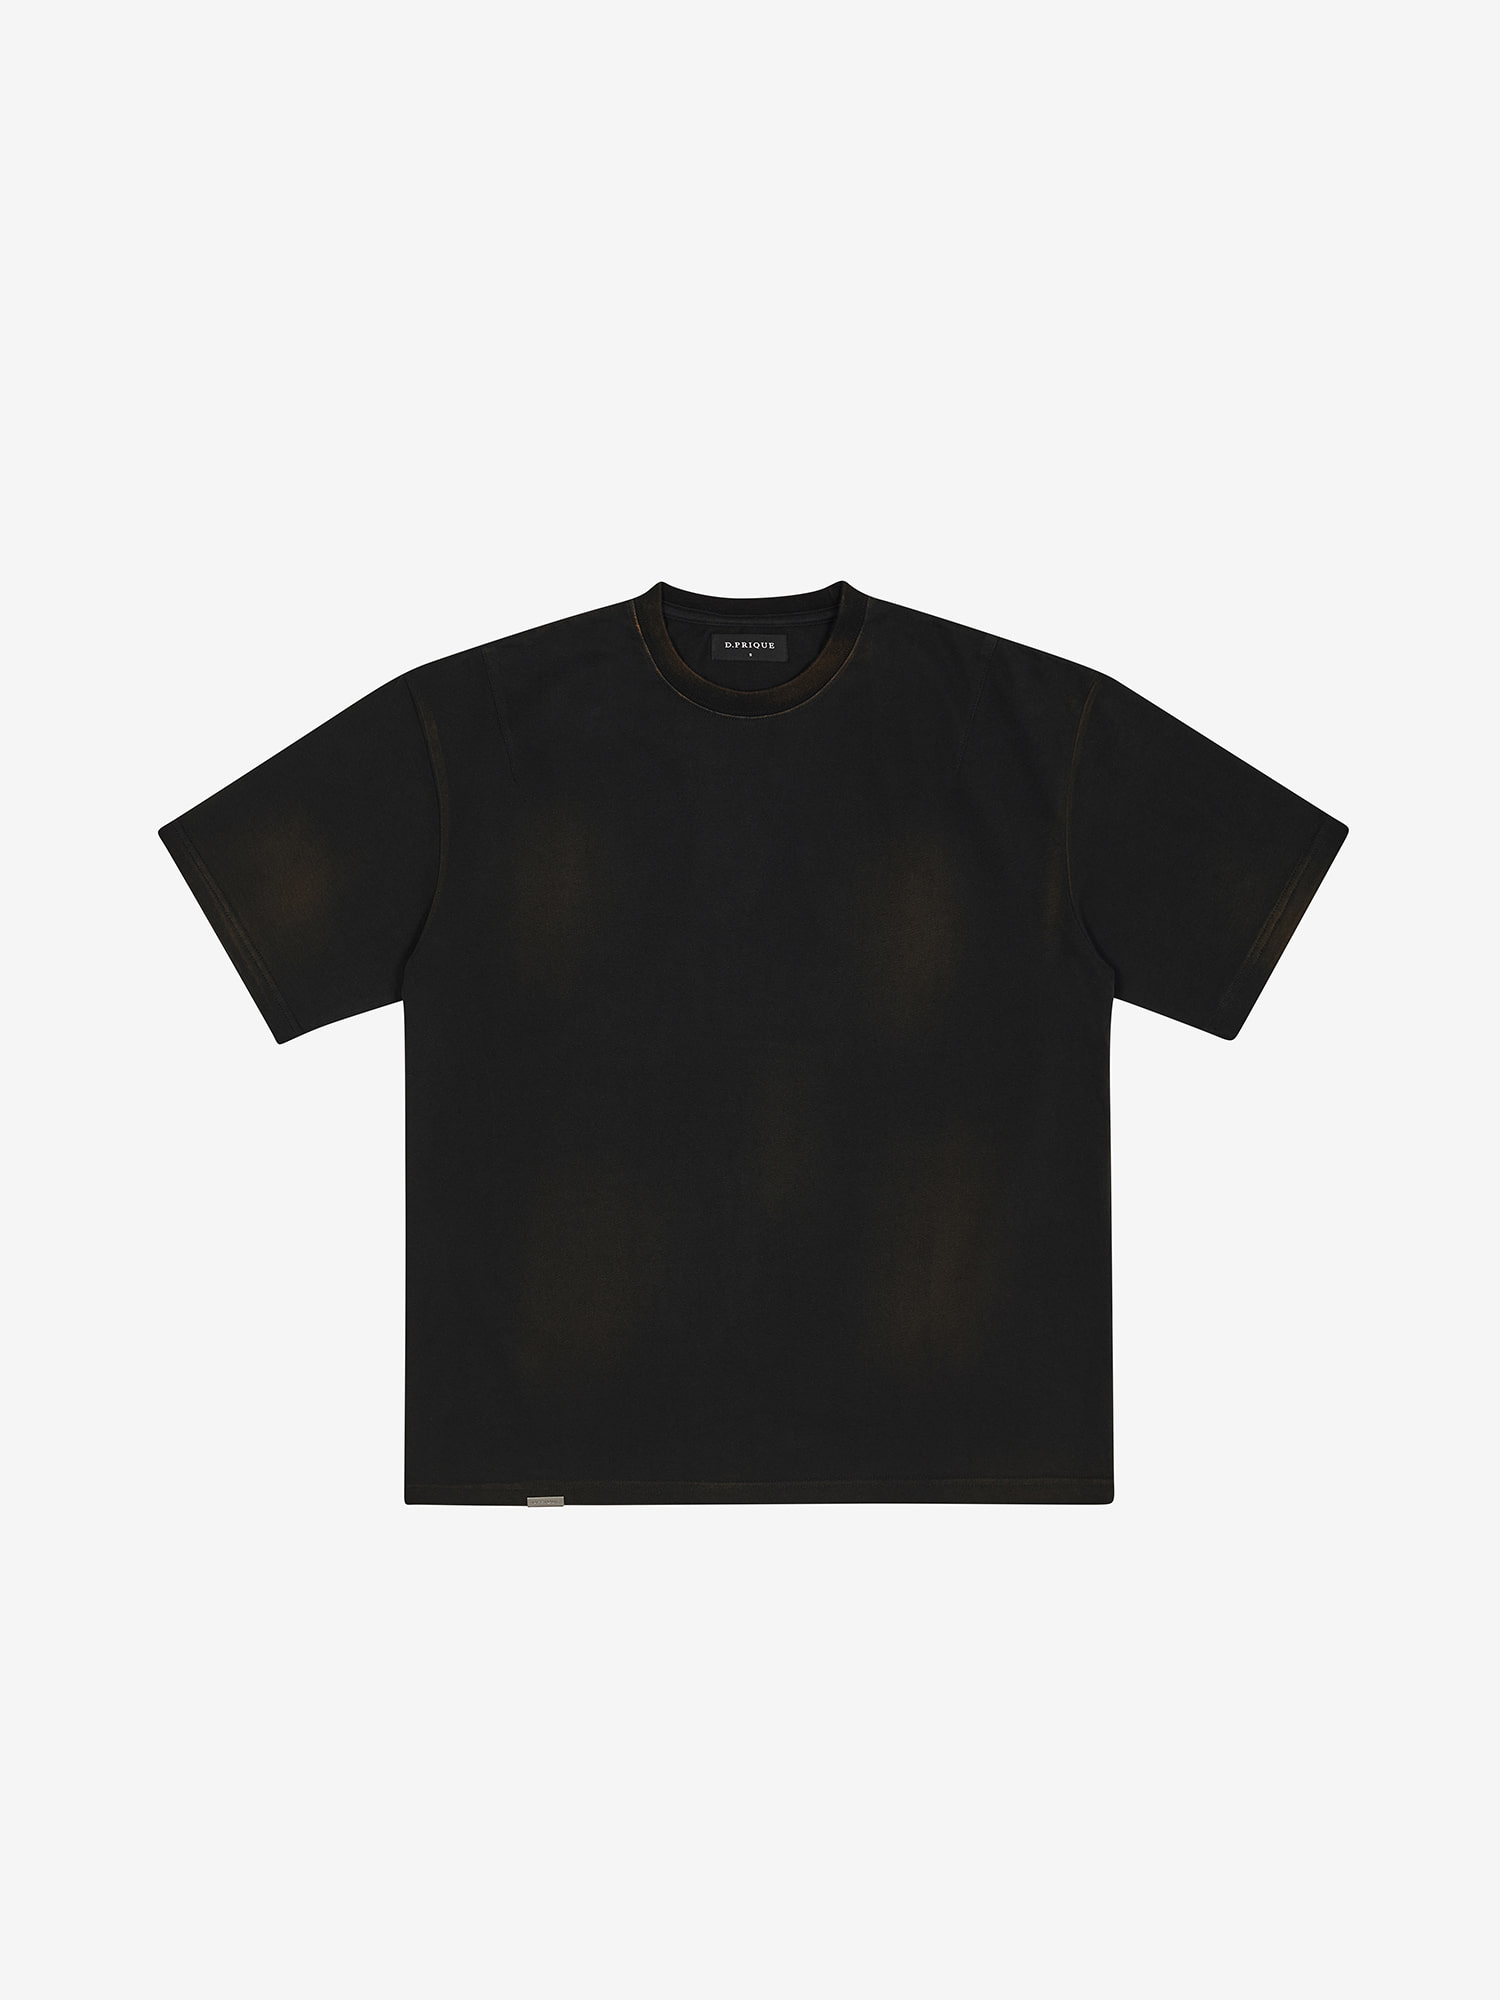 CLASSIC T-SHIRT - FADED BLACK